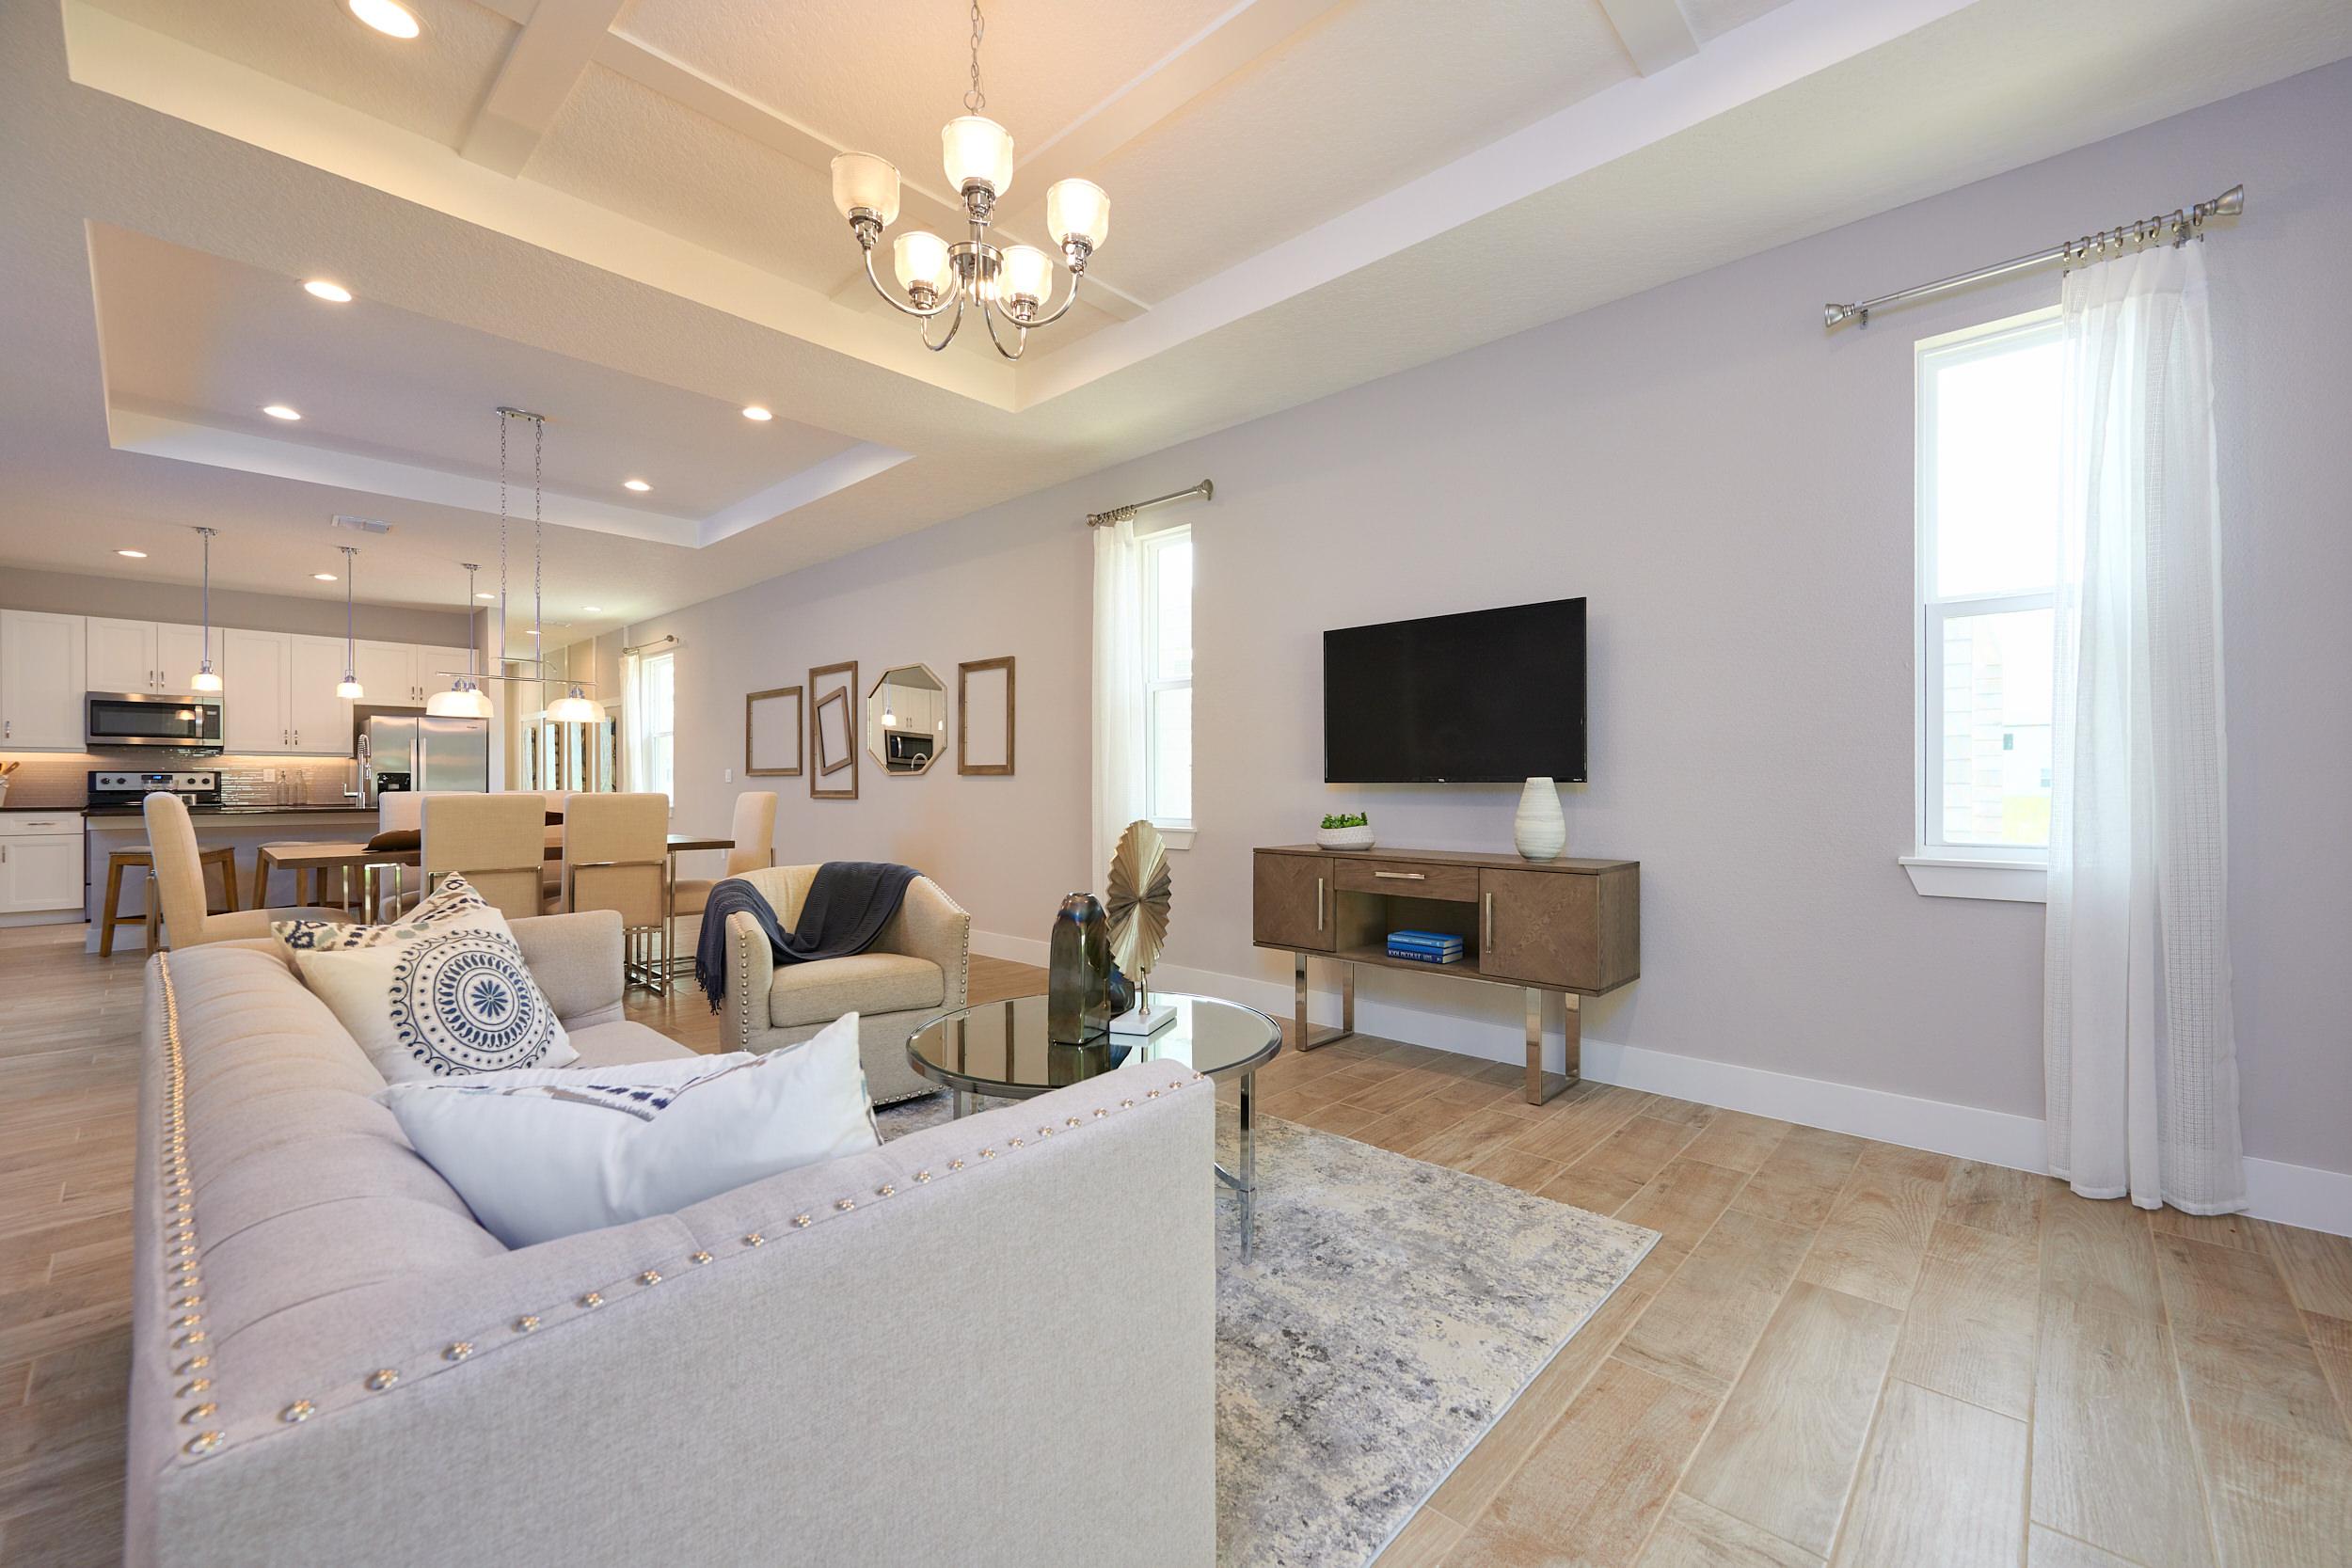 Modern Living Room | Modern Home Designs in Orlando, FL